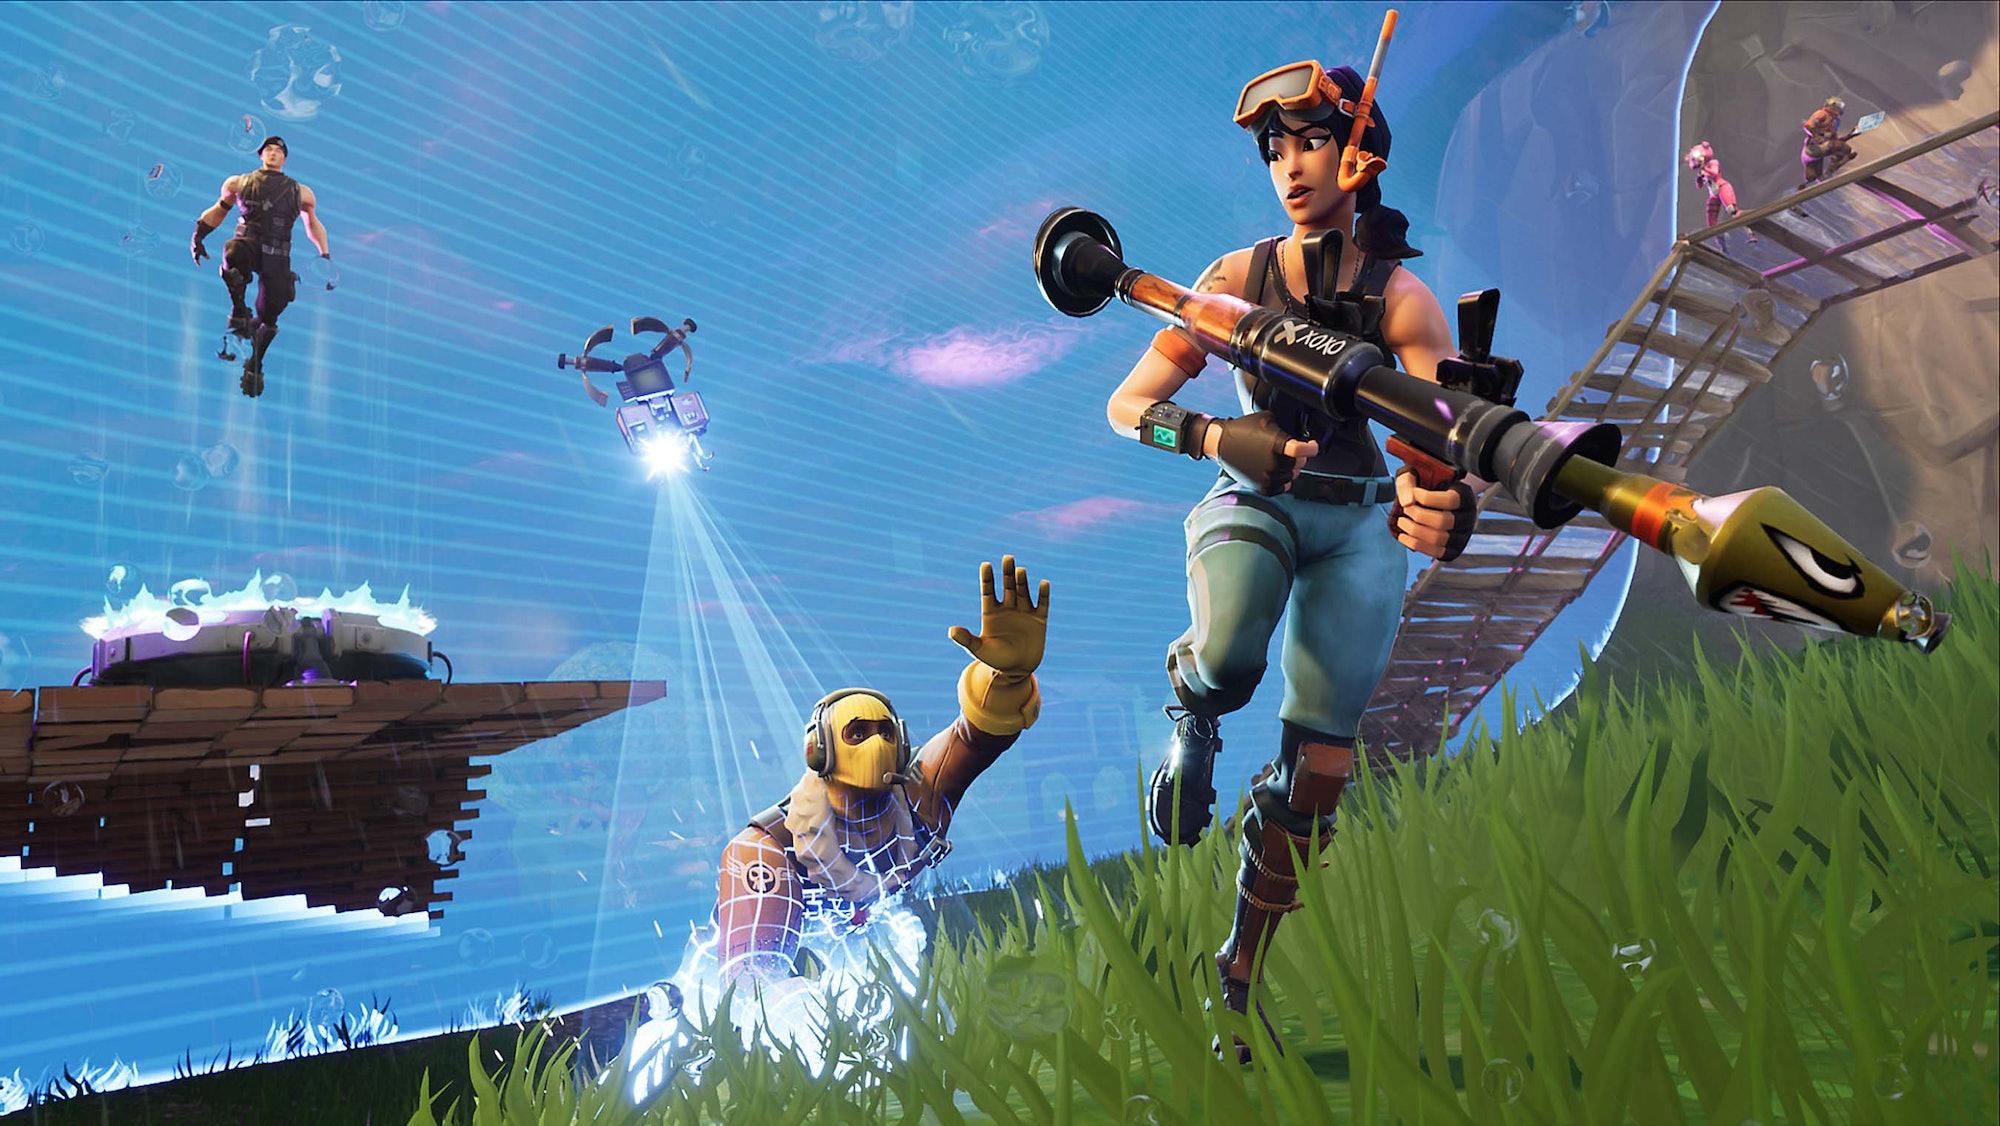 'Fortnite: Battle Royale' Storm